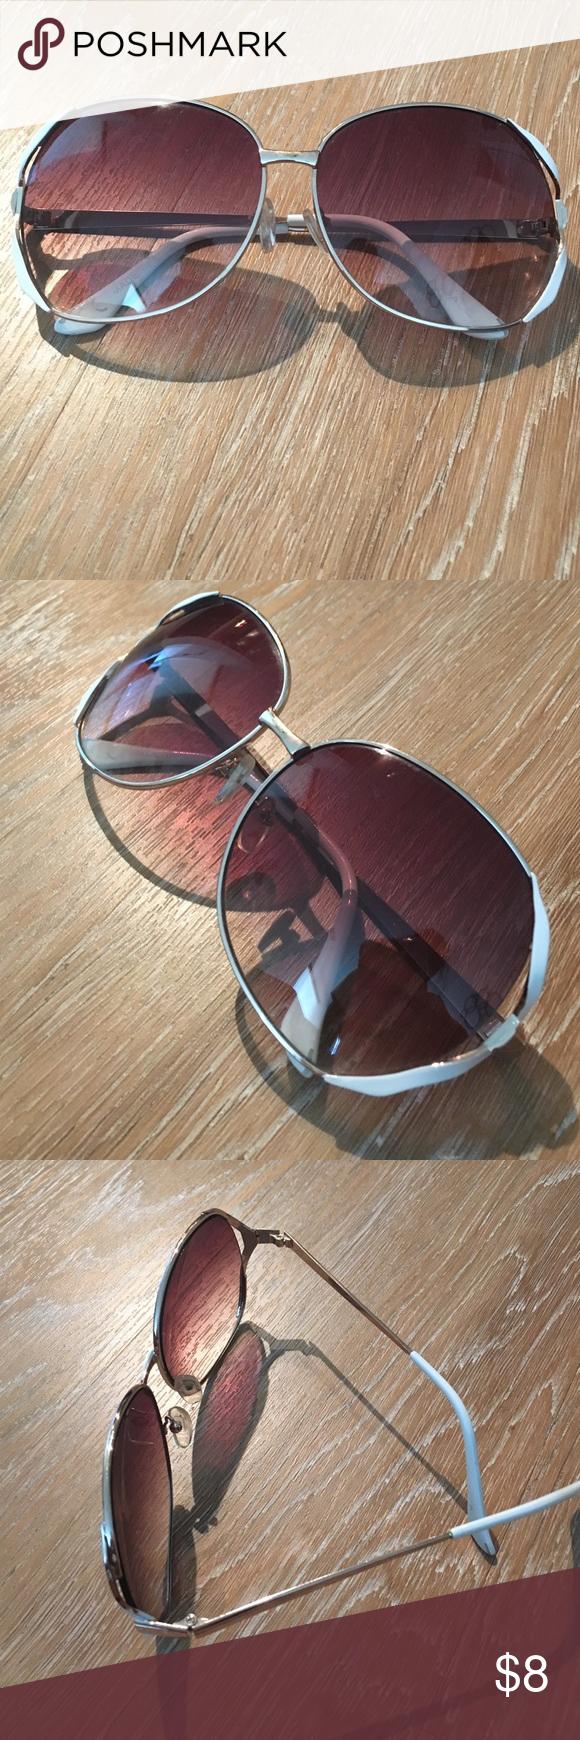 ALDO 🕶Sunnies🕶 Aldo brand sunglasses with white trim Aldo Accessories Sunglasses